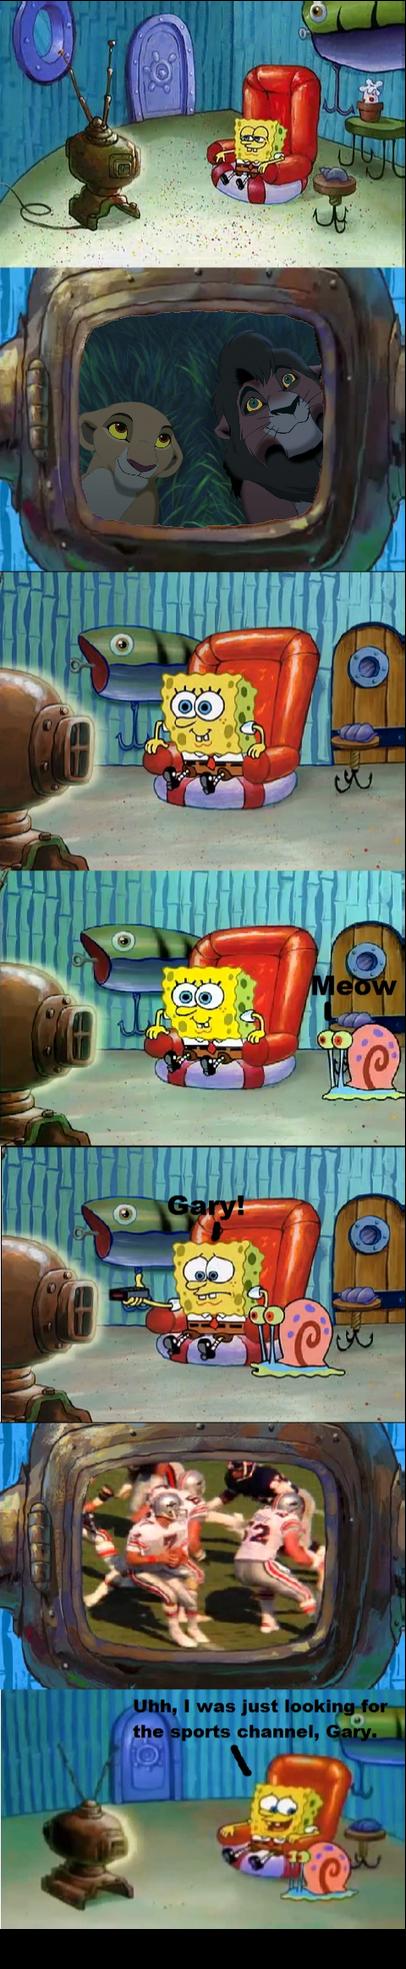 SpongeBob is watching The Lion King 2 by EmilioKiara